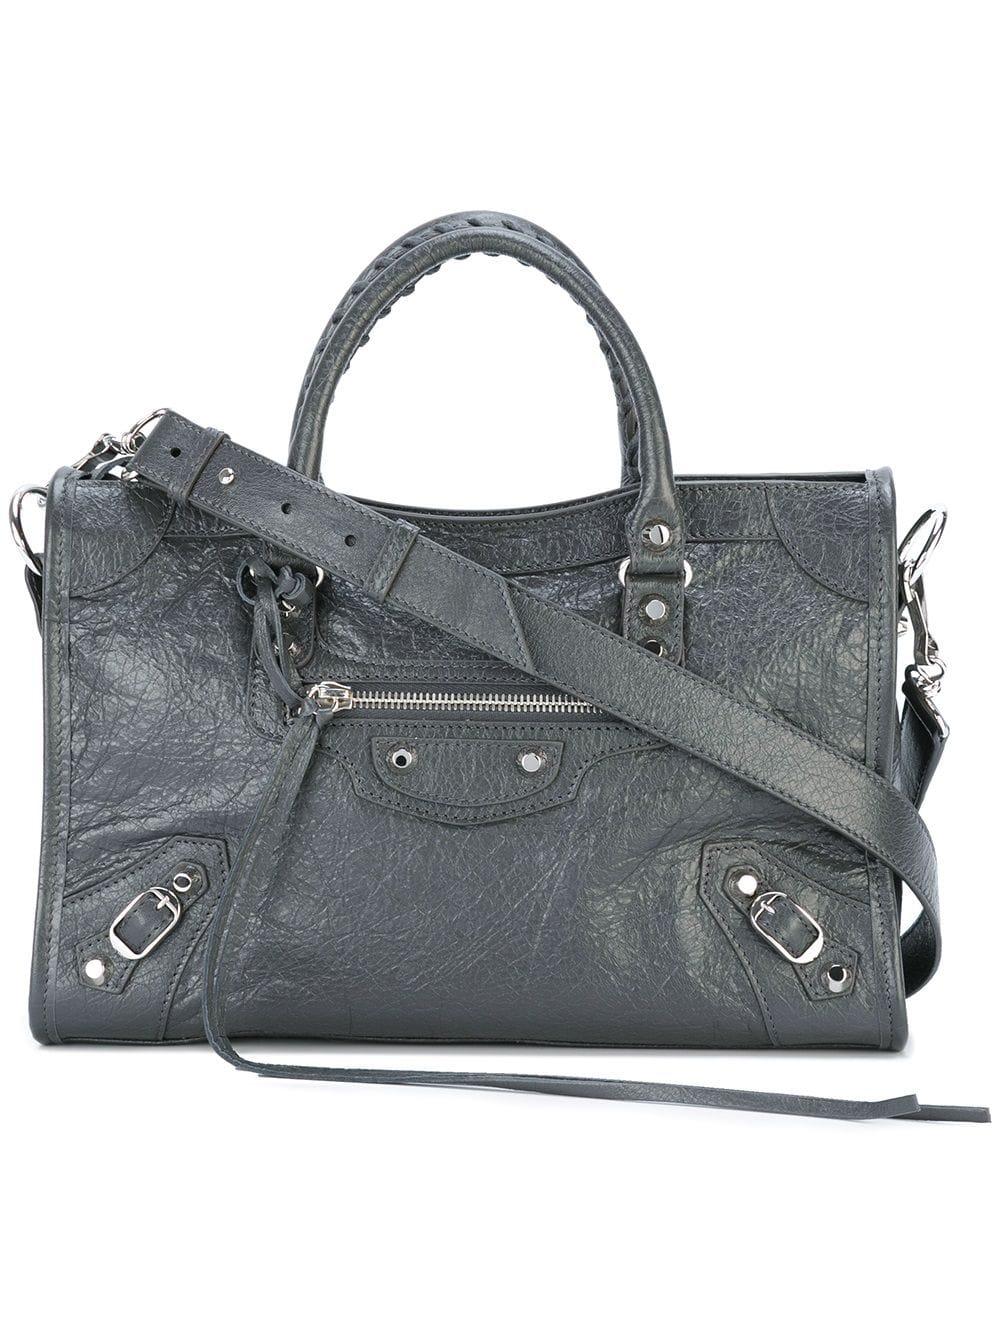 City Small Leather Handbag